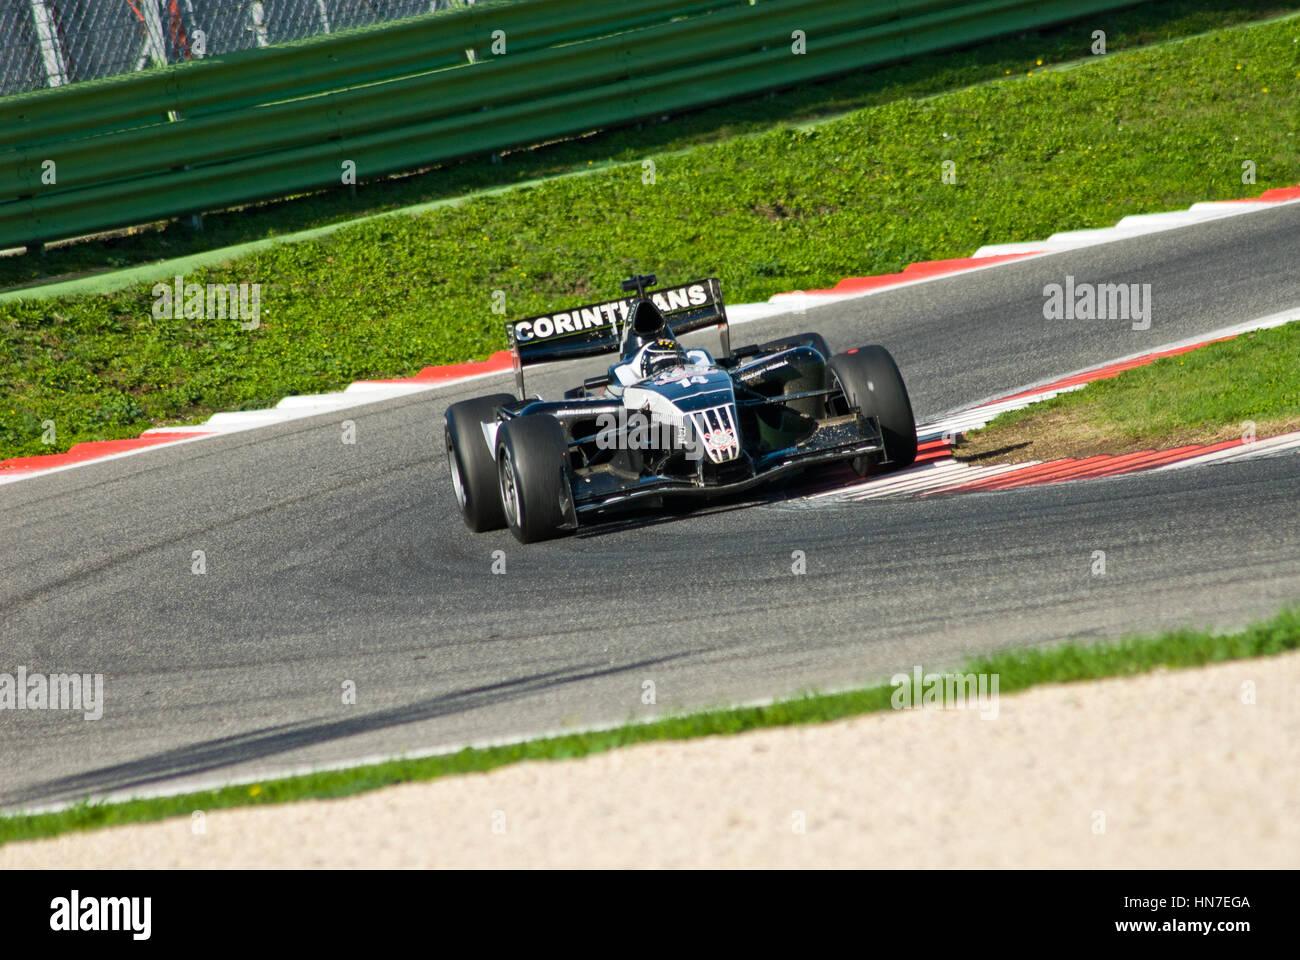 Circuito Vallelunga : Vallelunga al via l aci racing weekend